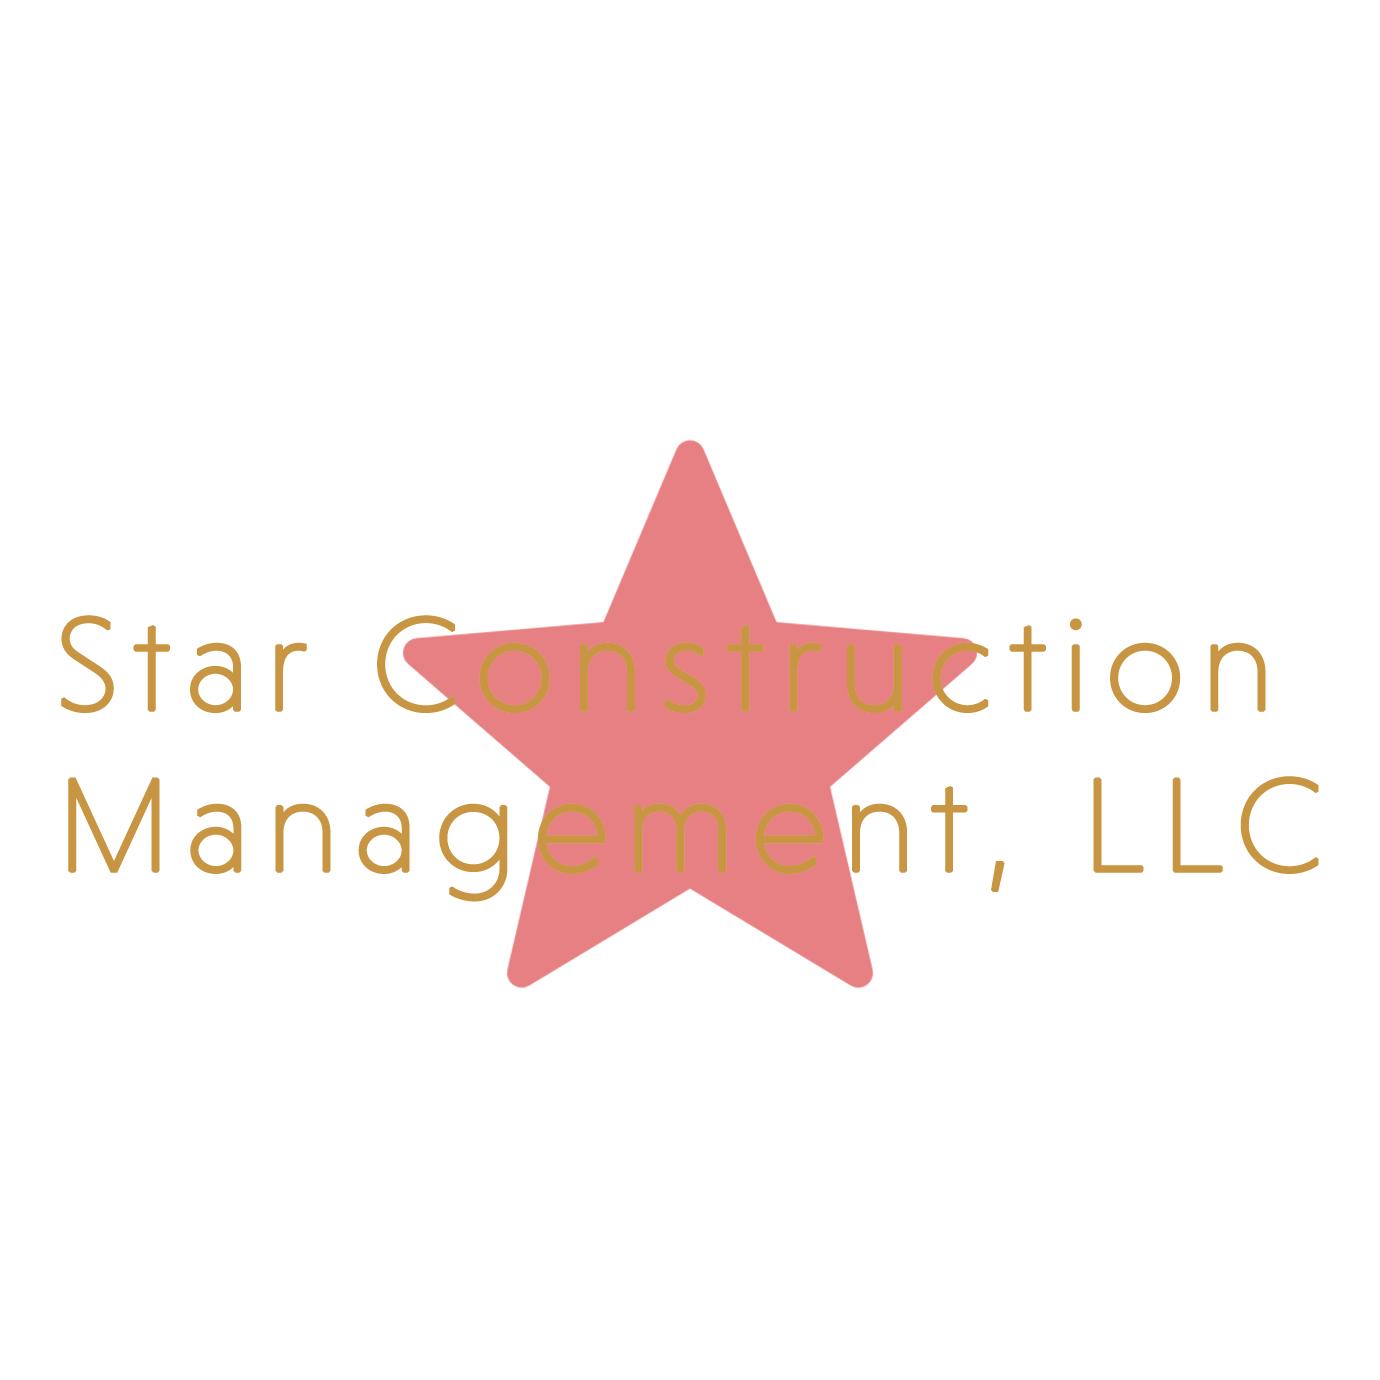 Star Construction Management, LLC